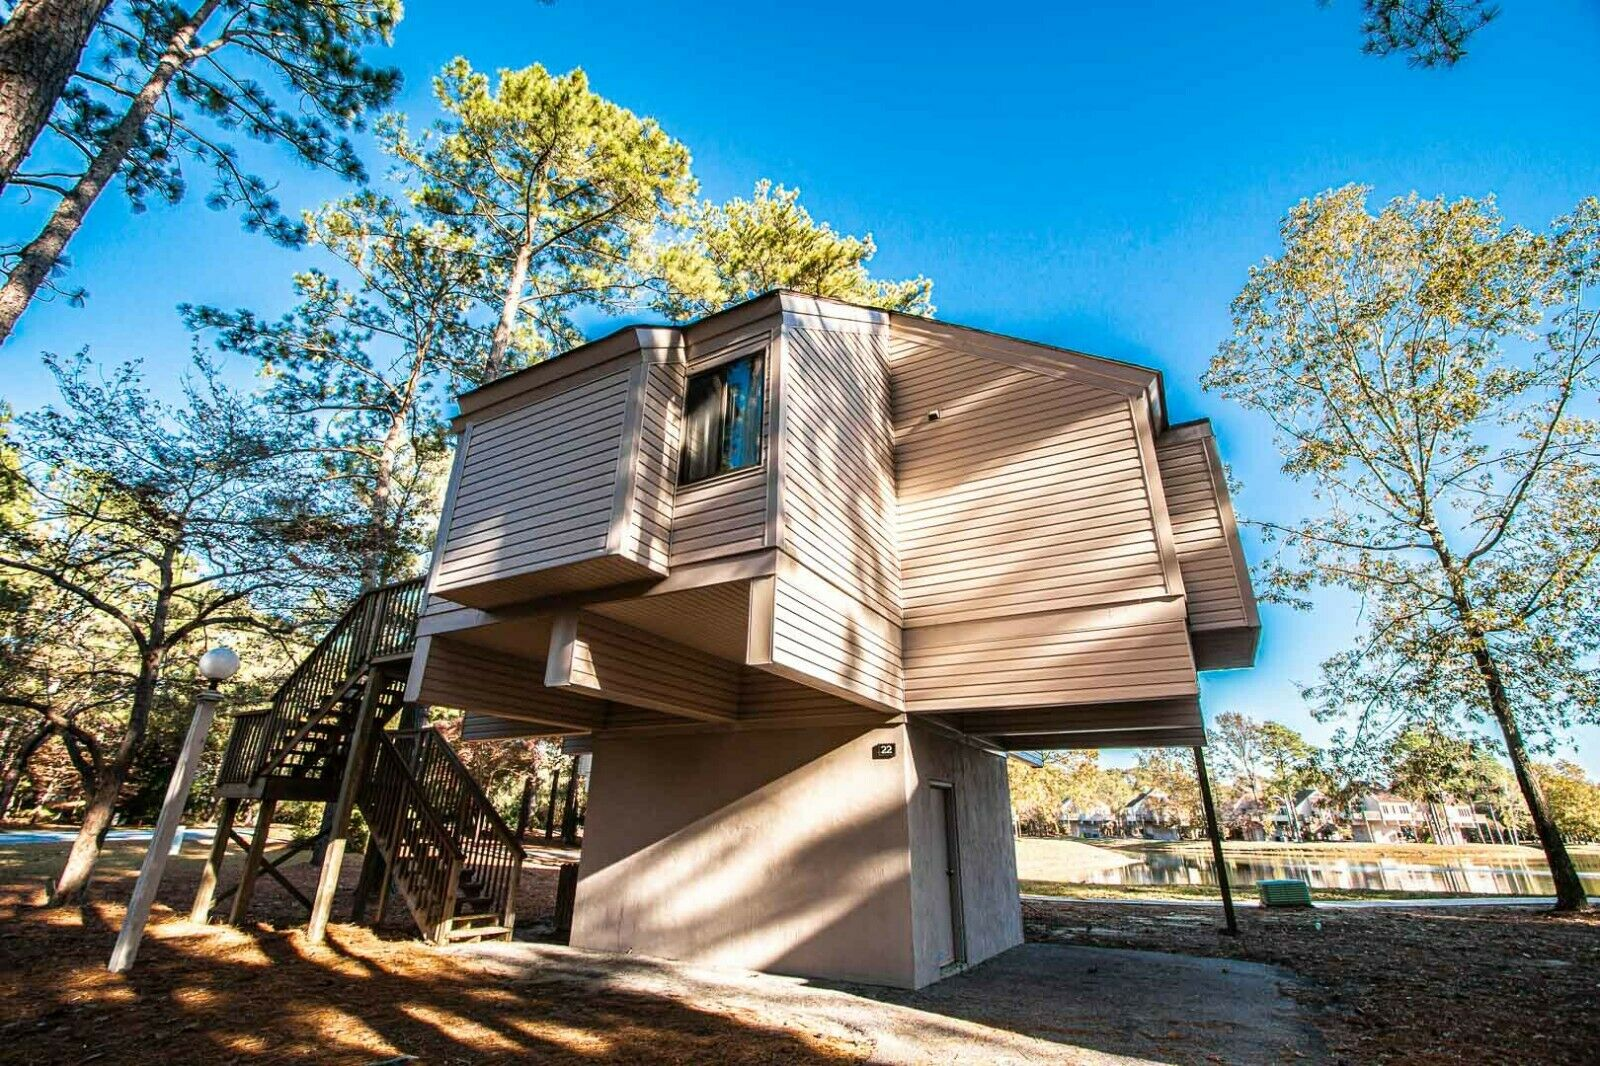 Waterwood Townhouses Timeshare New Bern North Carolina - $1.00